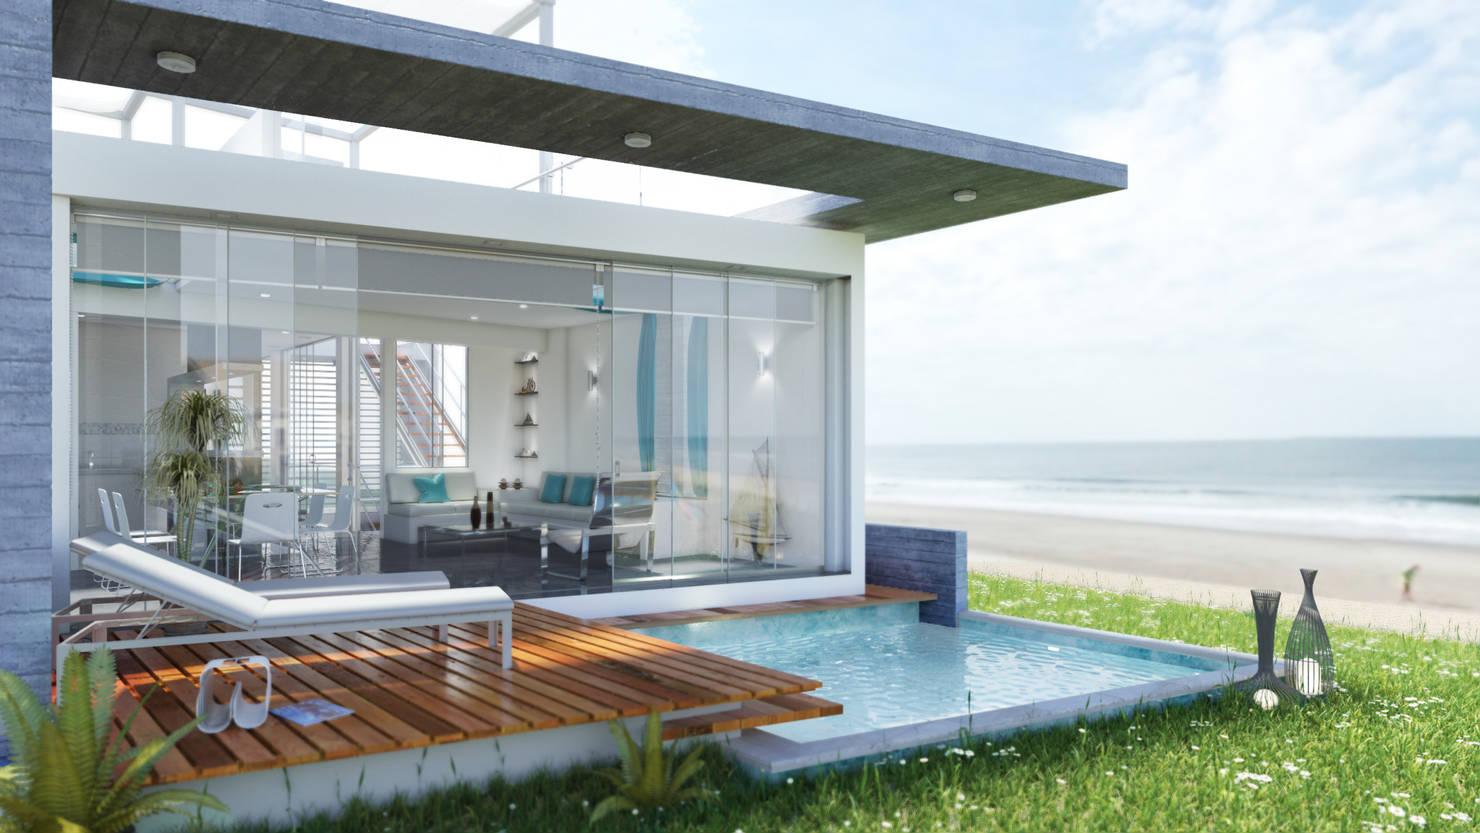 10 Ideas de decoración para casas limeñas